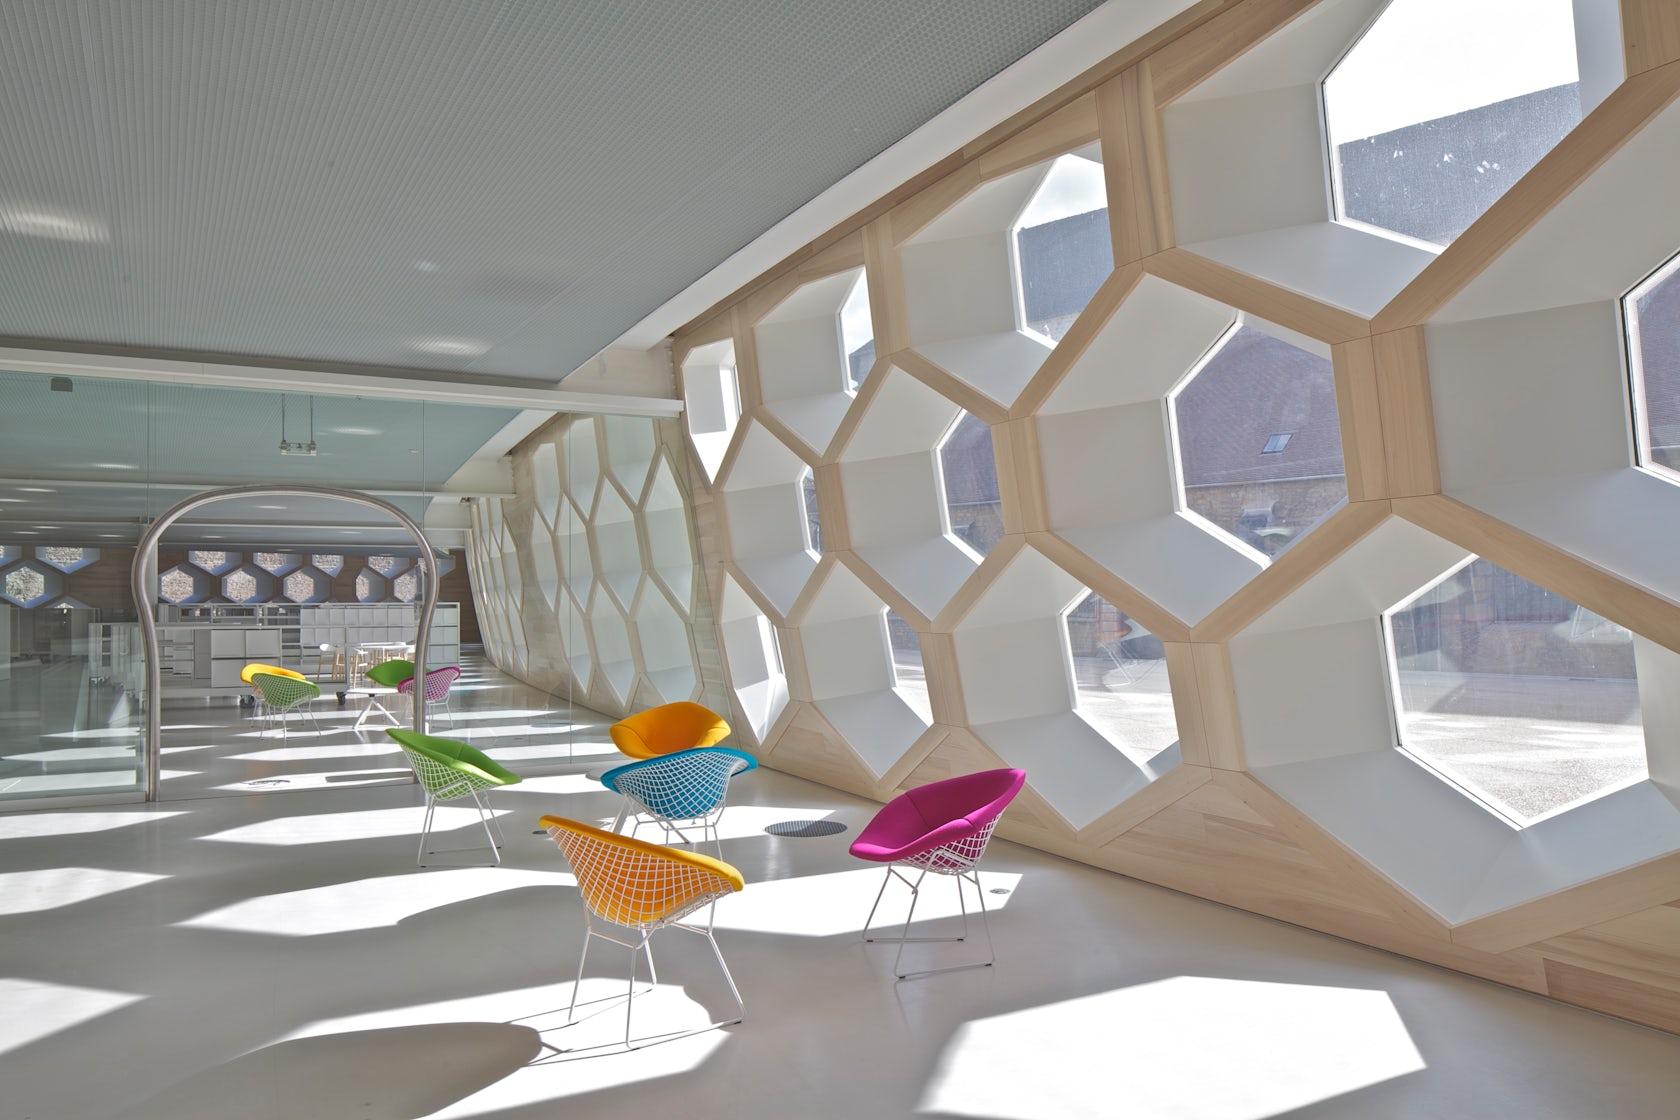 lons le saunier library architizer. Black Bedroom Furniture Sets. Home Design Ideas